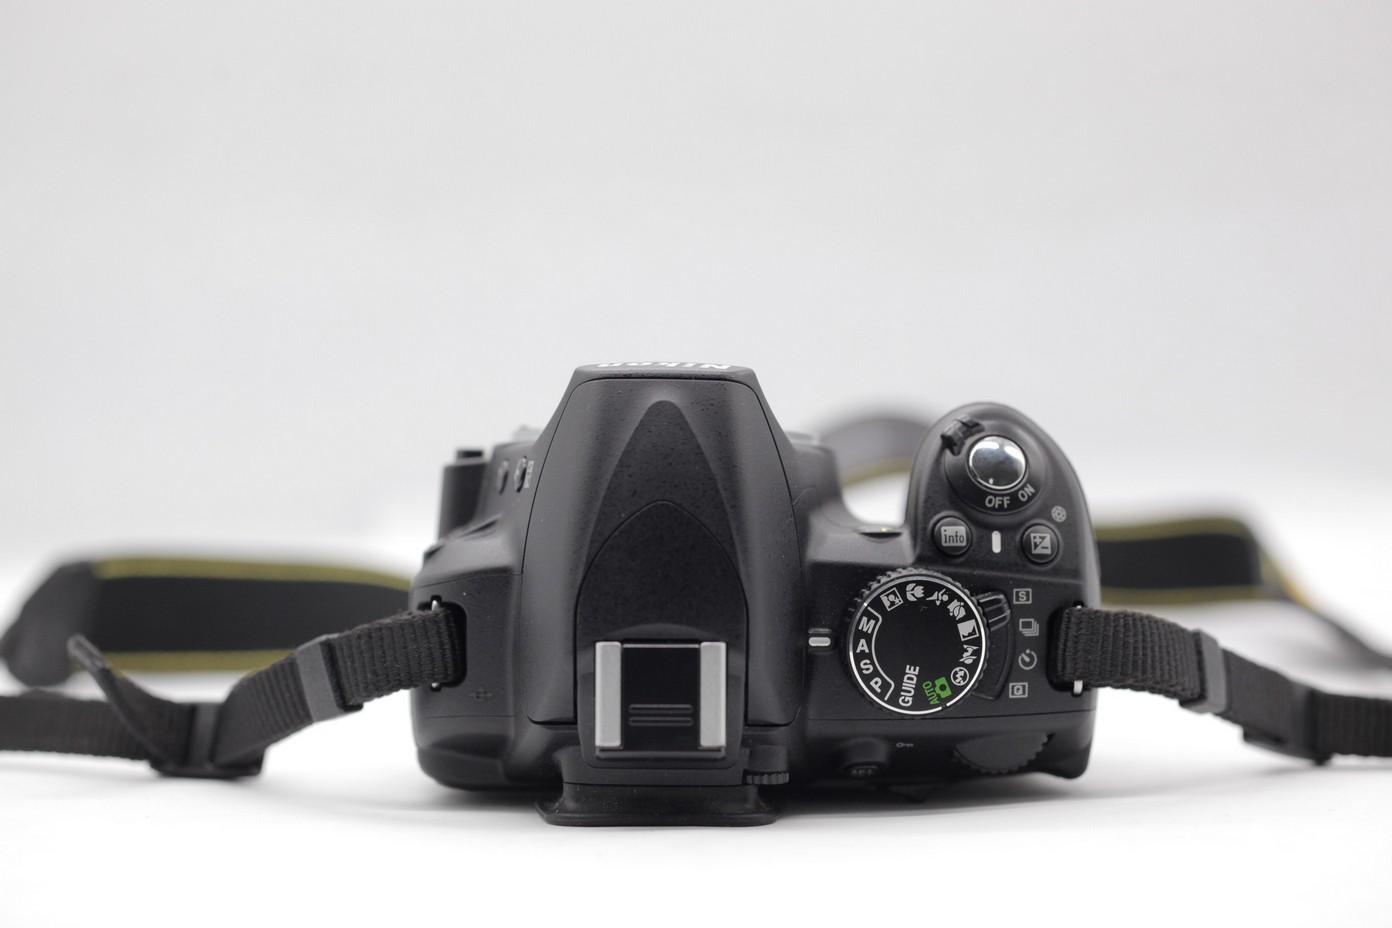 Used - Nikon D3100 DSLR Body Only SC 5k